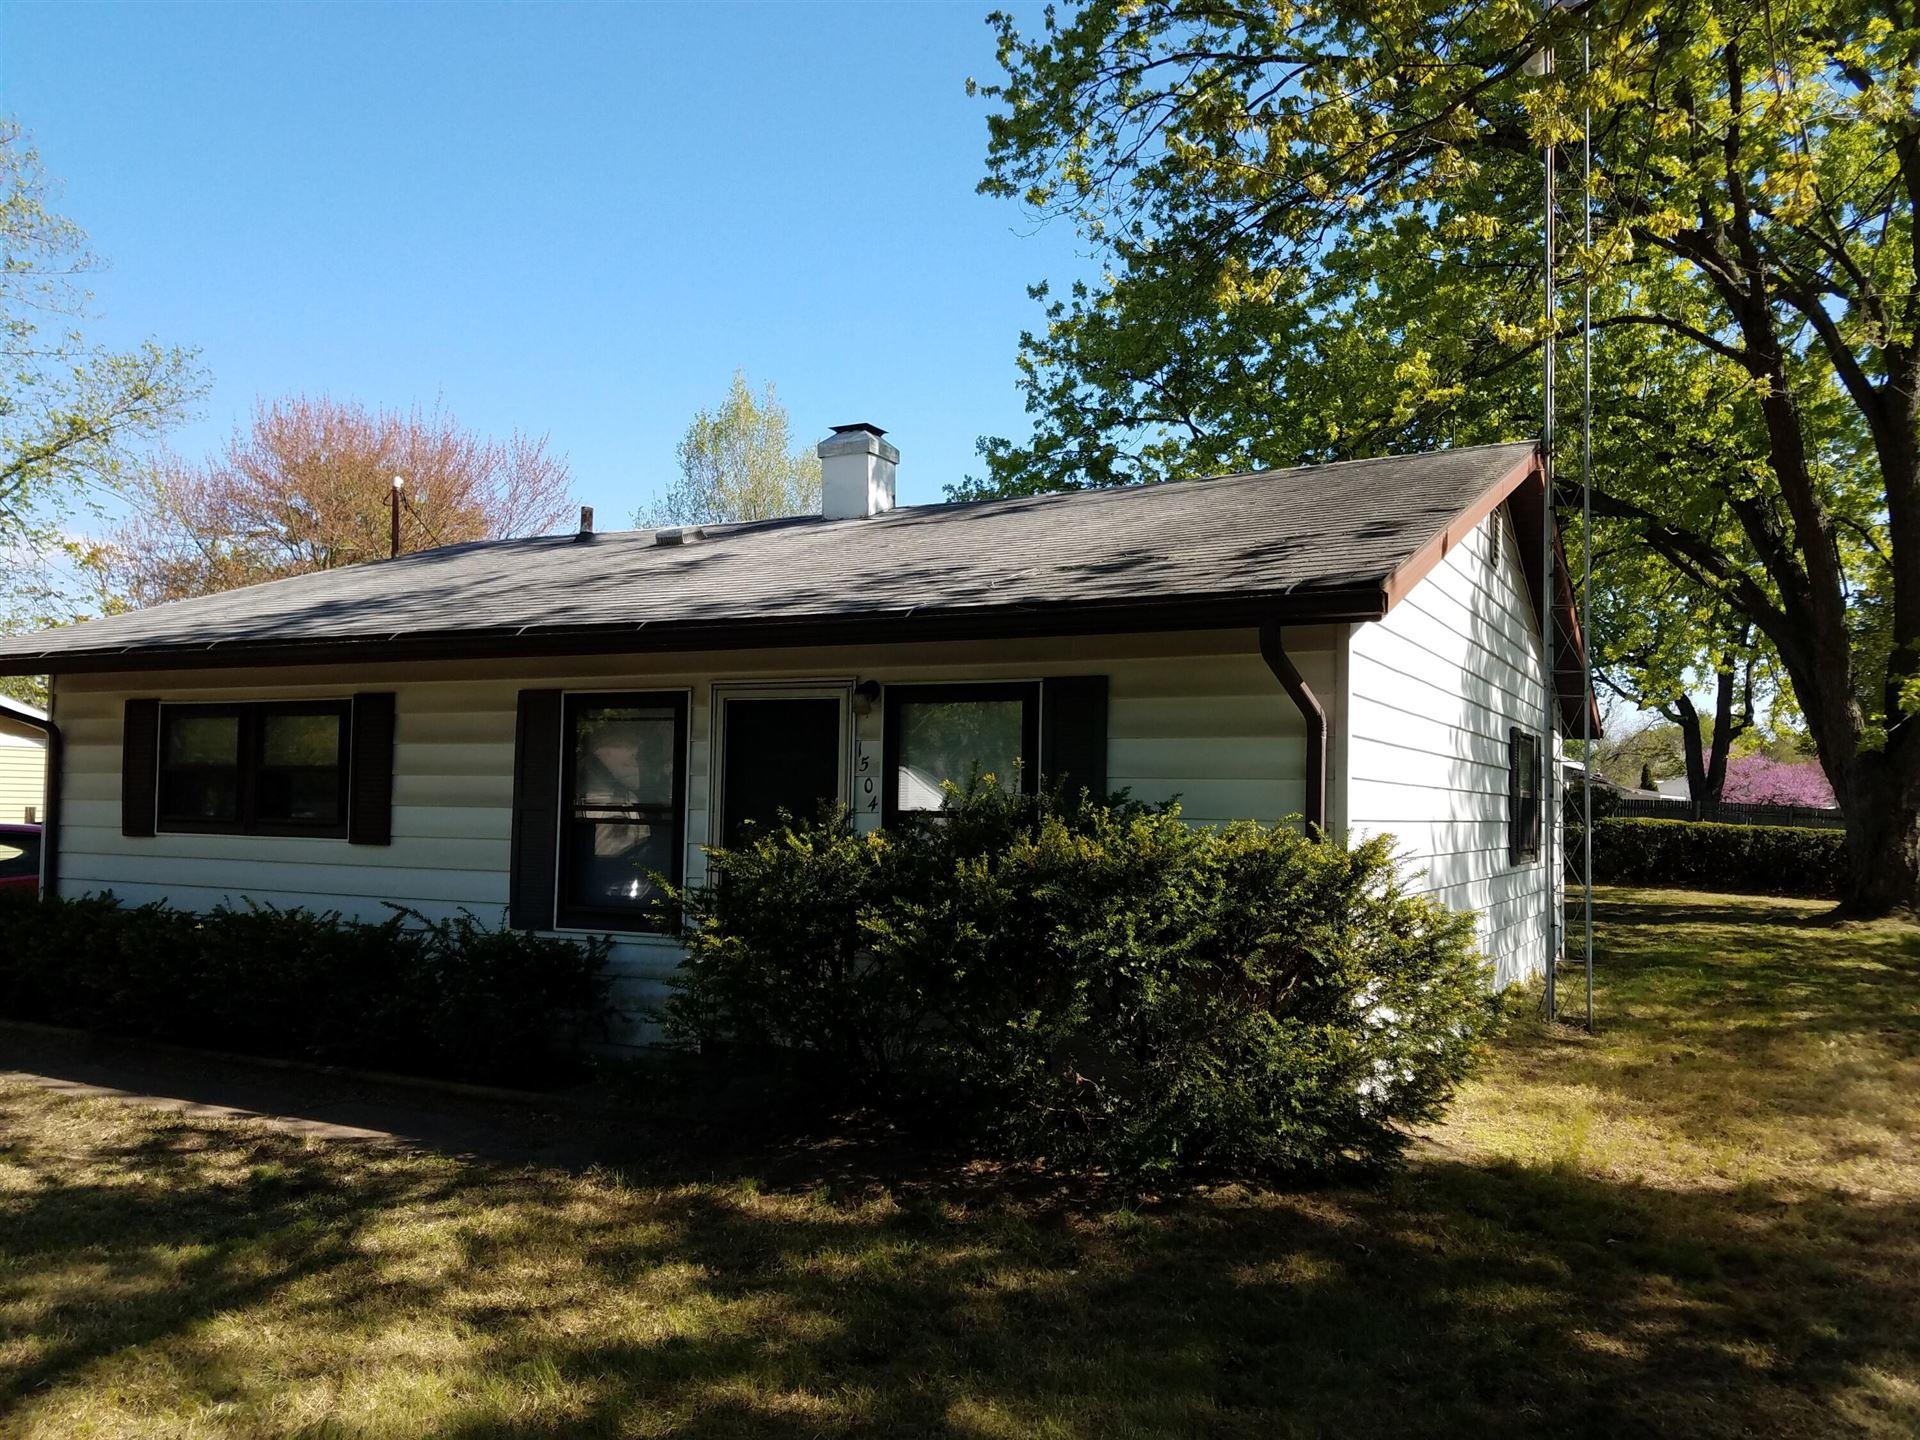 1504 Fulkerson Road, Niles, MI 49120 - MLS#: 21016152